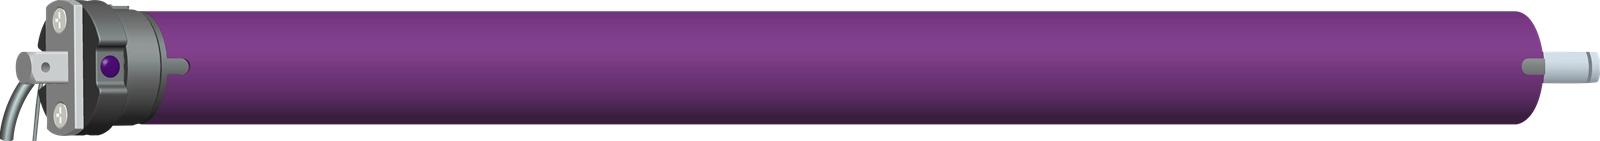 REHENT WiFi Roller Shutter Slats Blinds Motor DC Wireless Remote Control Curtain Via Smart life APP